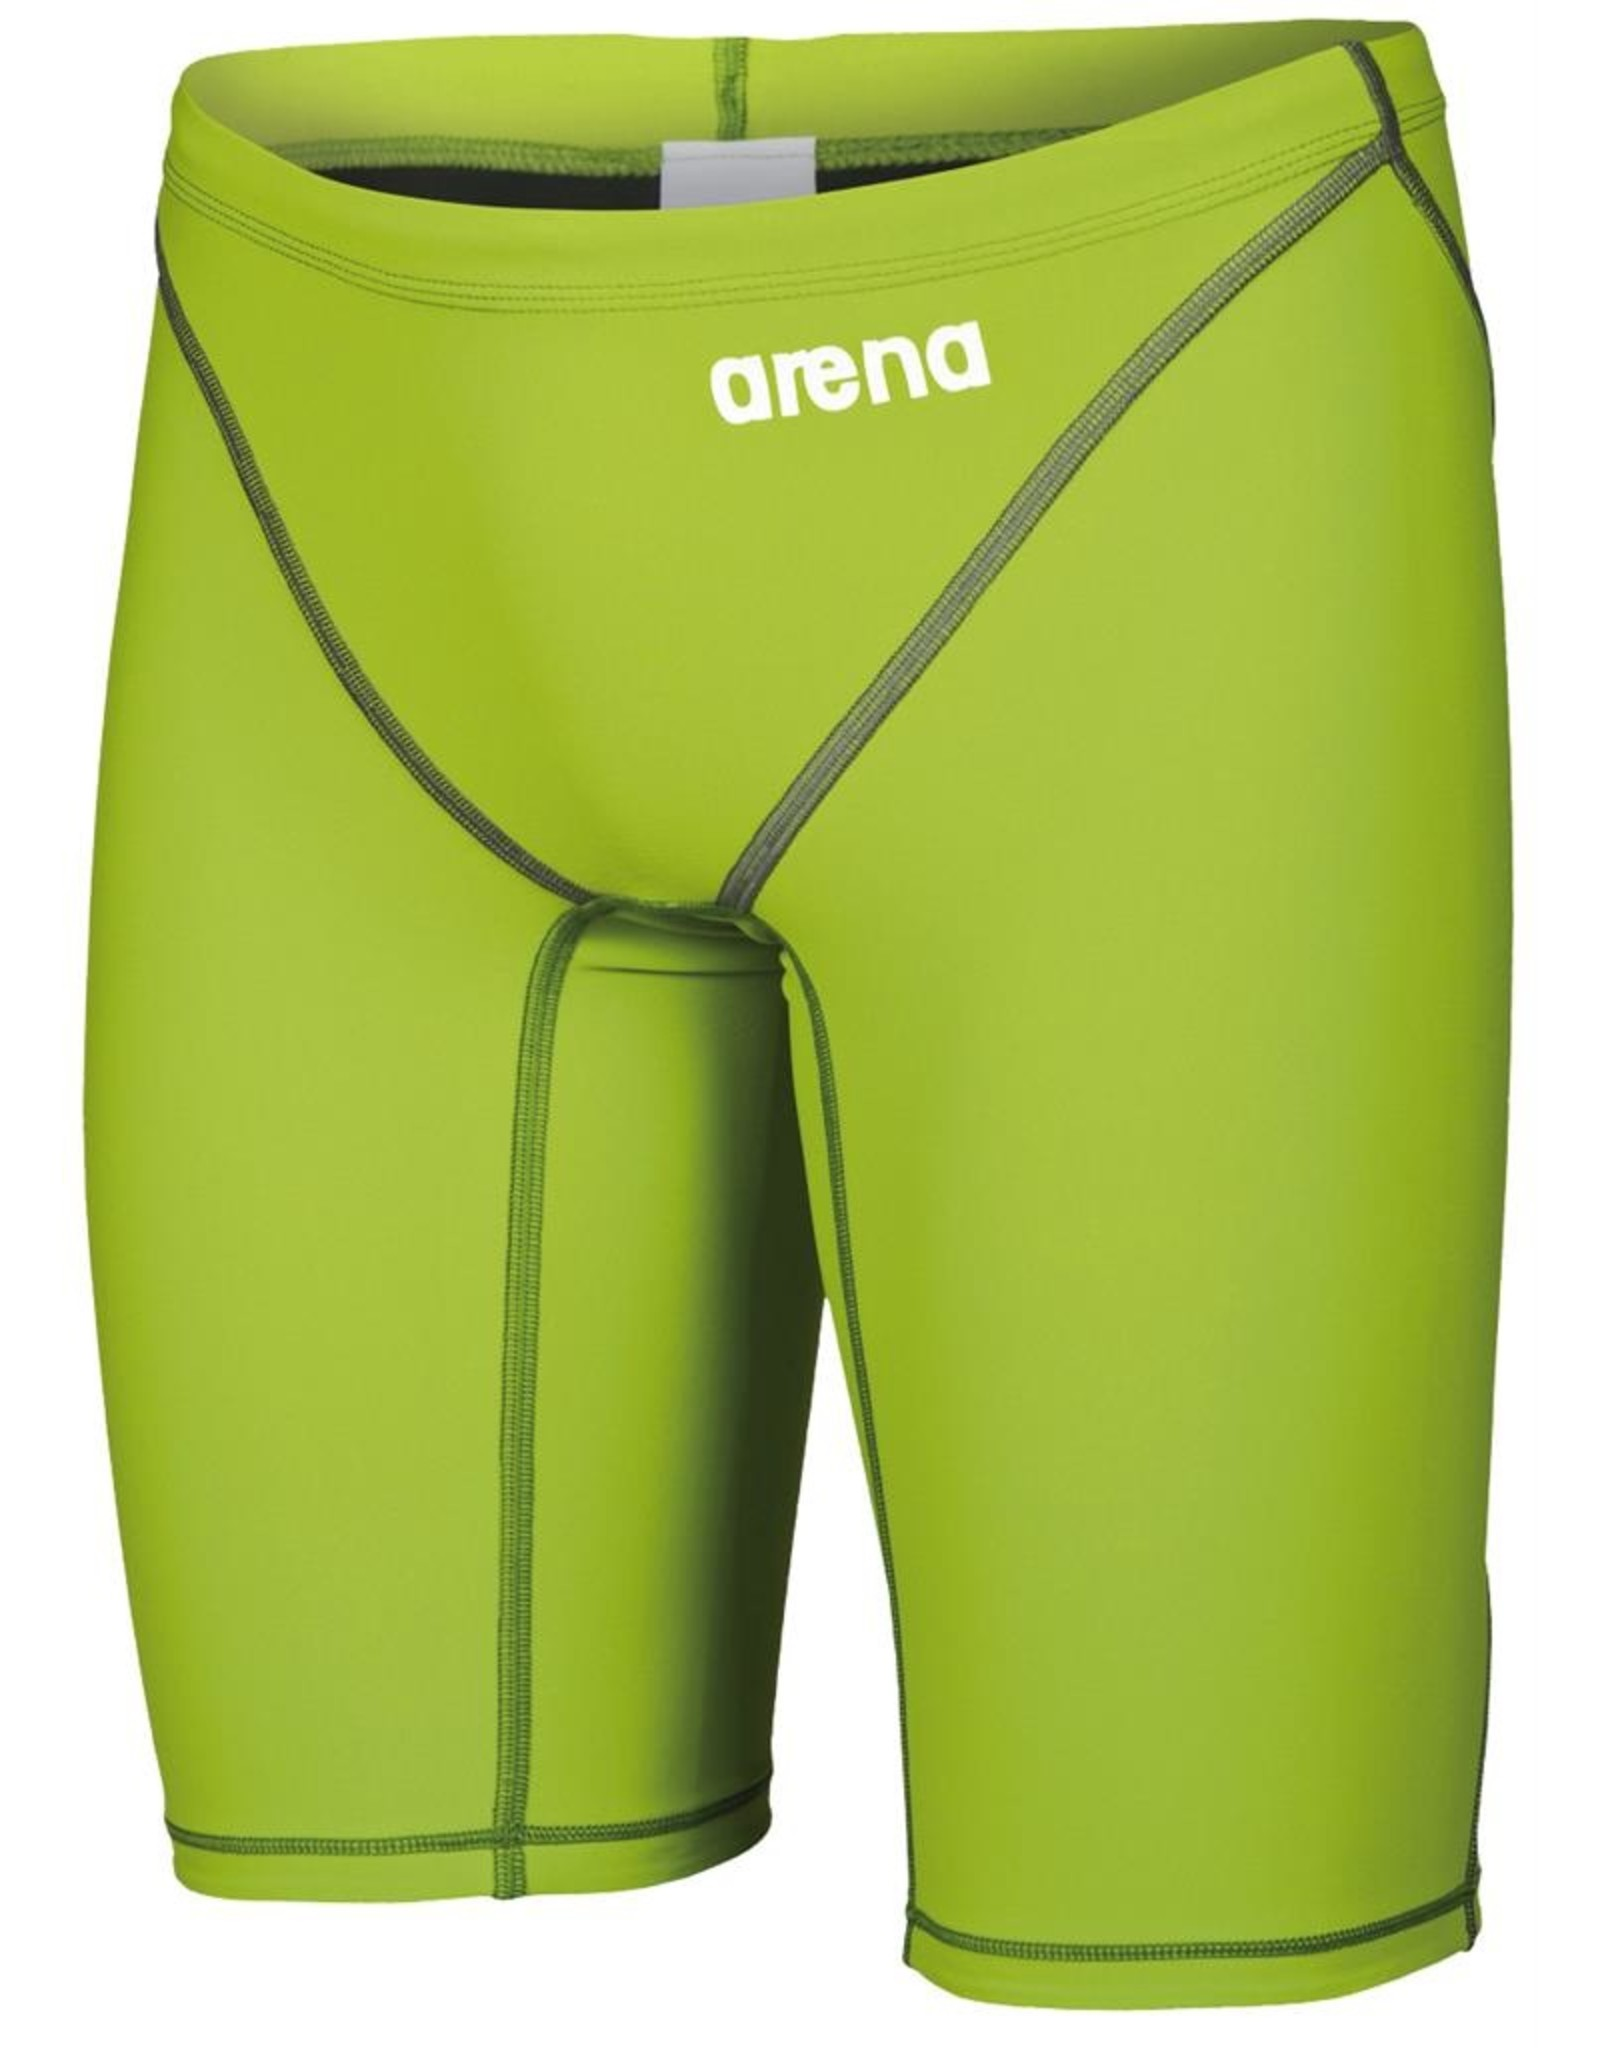 ARENA ARENA POWERSKIN ST 2.0 JAMMER